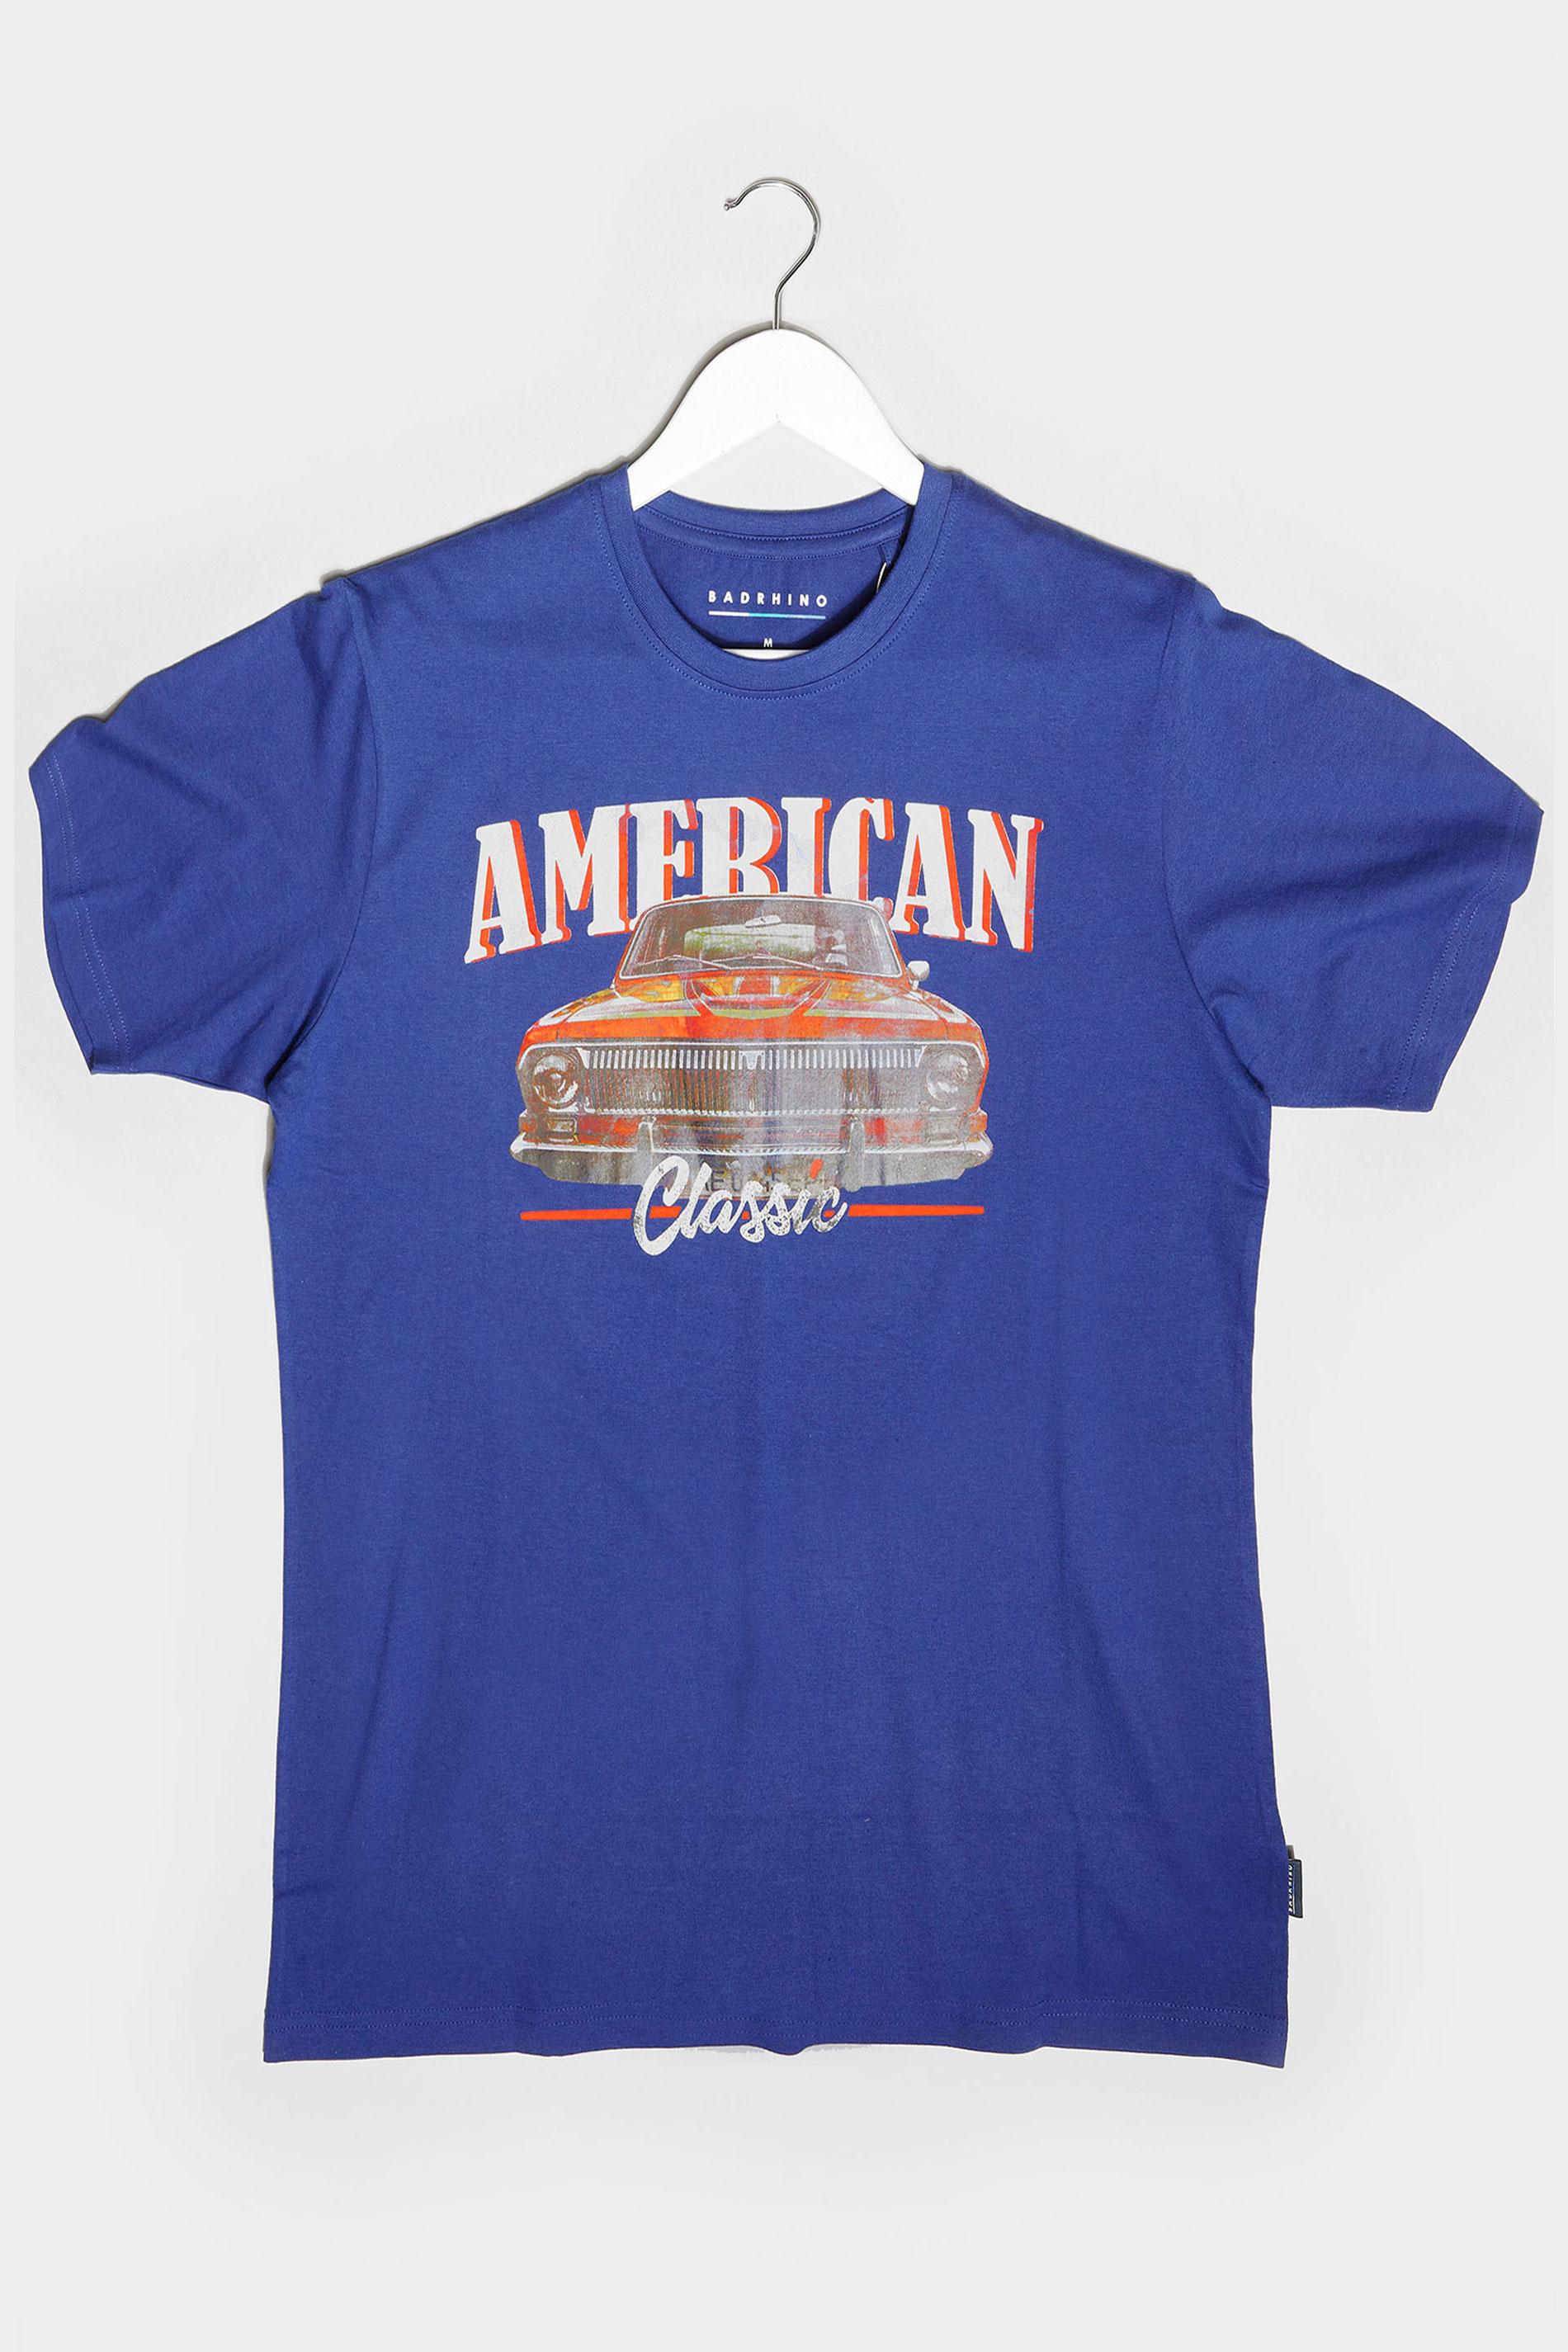 BadRhino Royal Blue American Classic Car Graphic Print T-Shirt